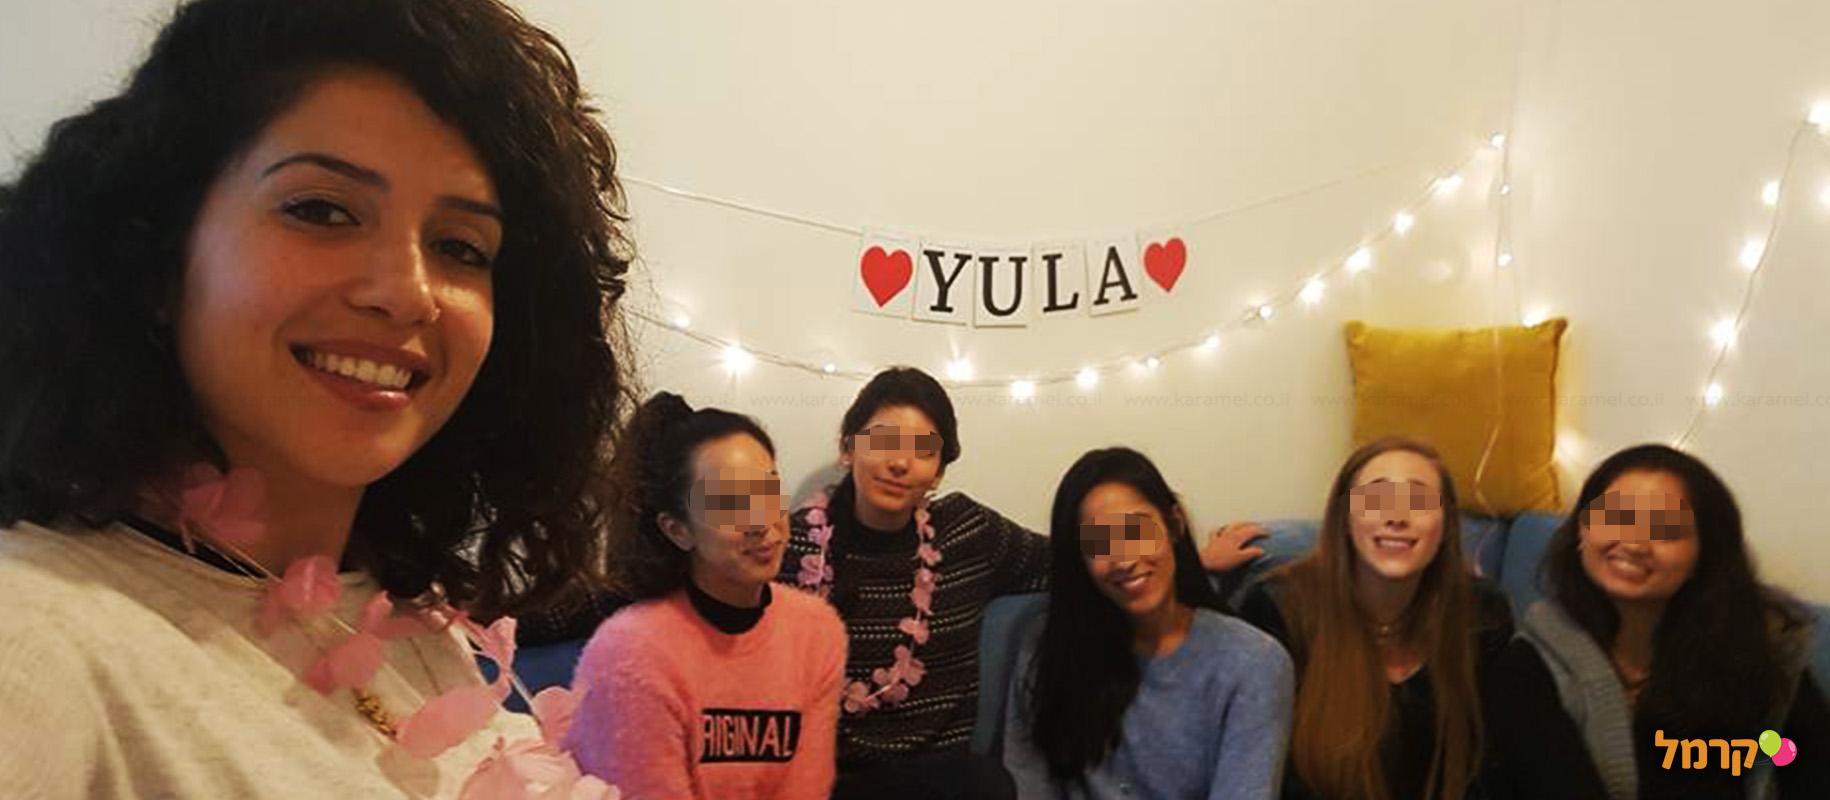 yula - הפעלה לוהטת לרווקה - 073-7829288